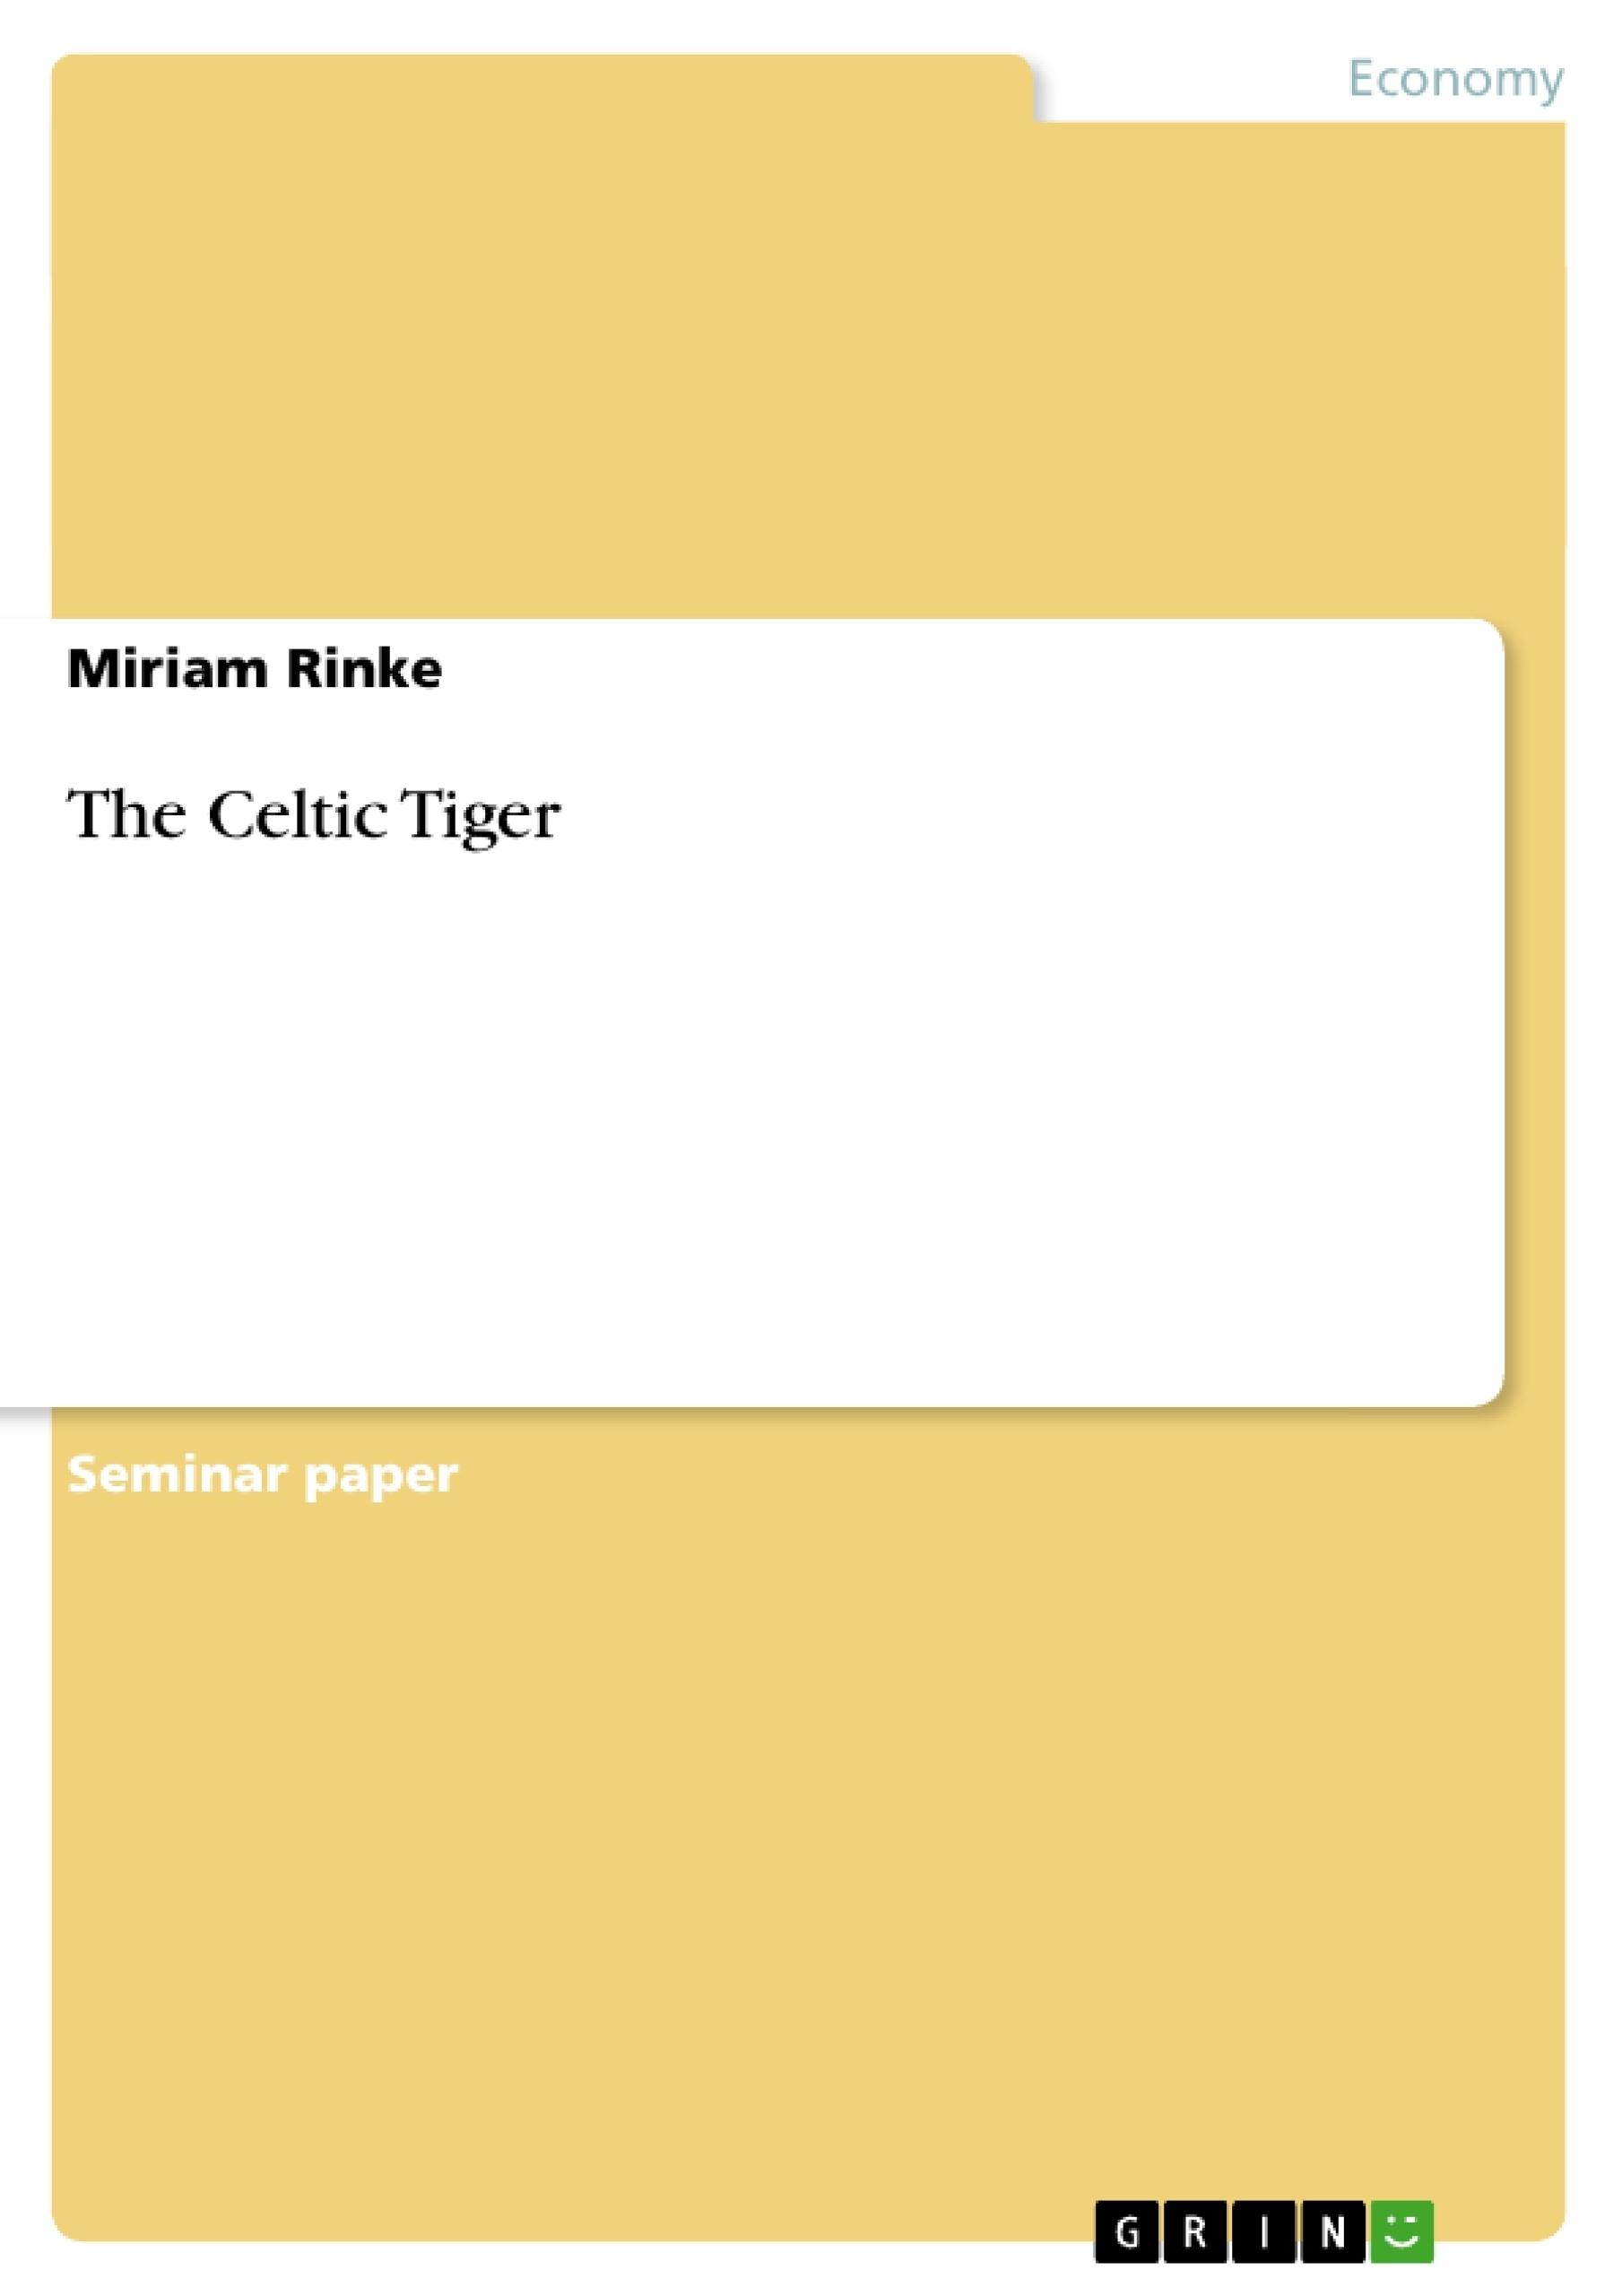 Title: The Celtic Tiger